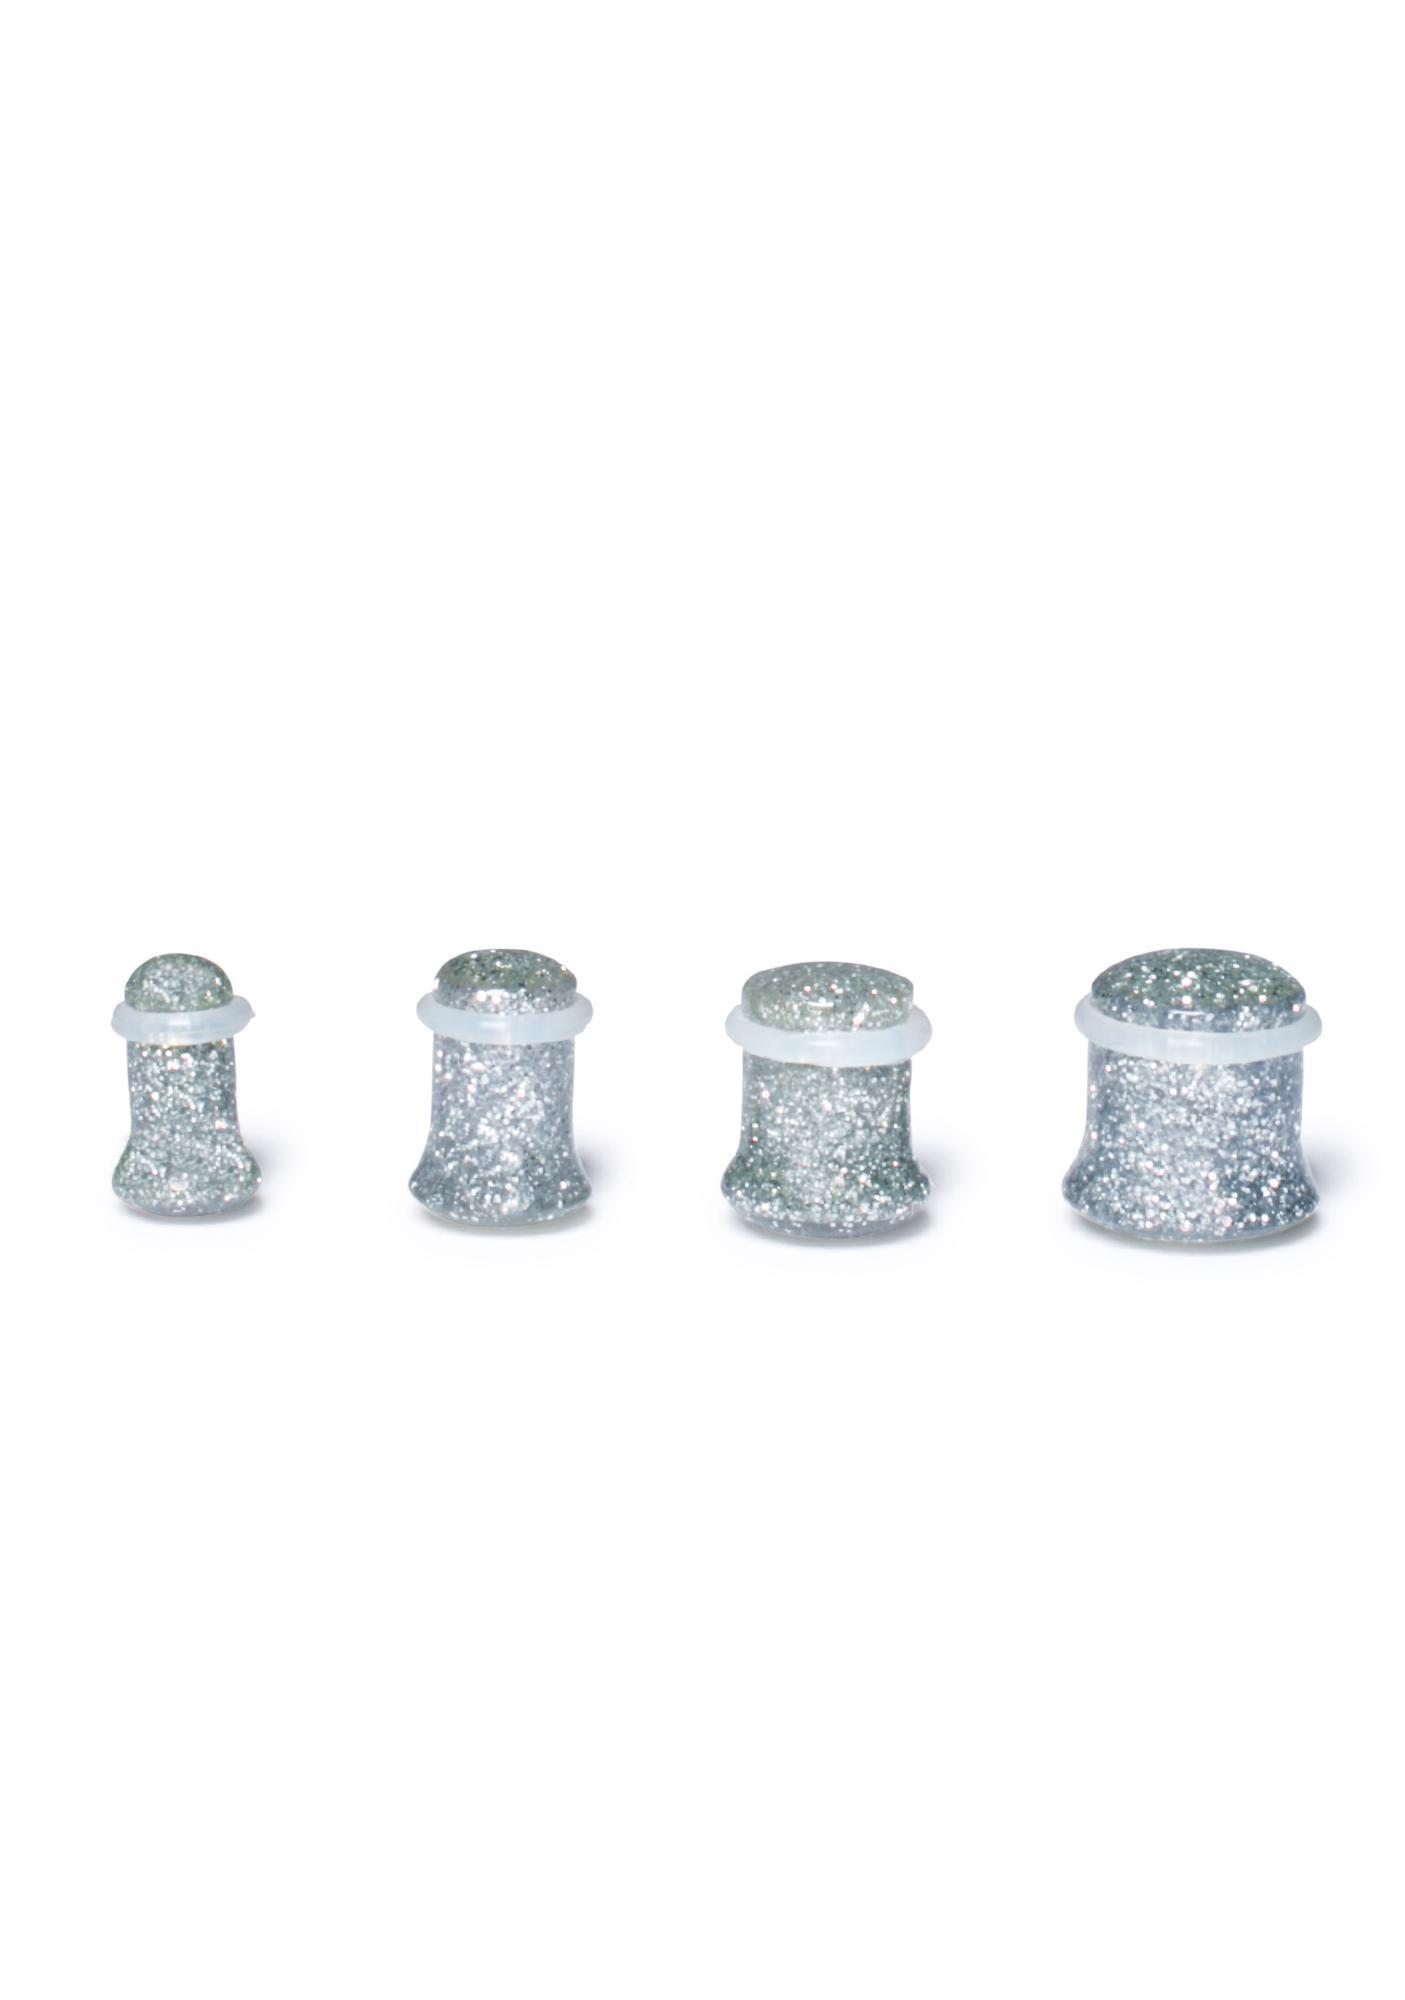 Silver Dreams Gauged Glitter Plugs